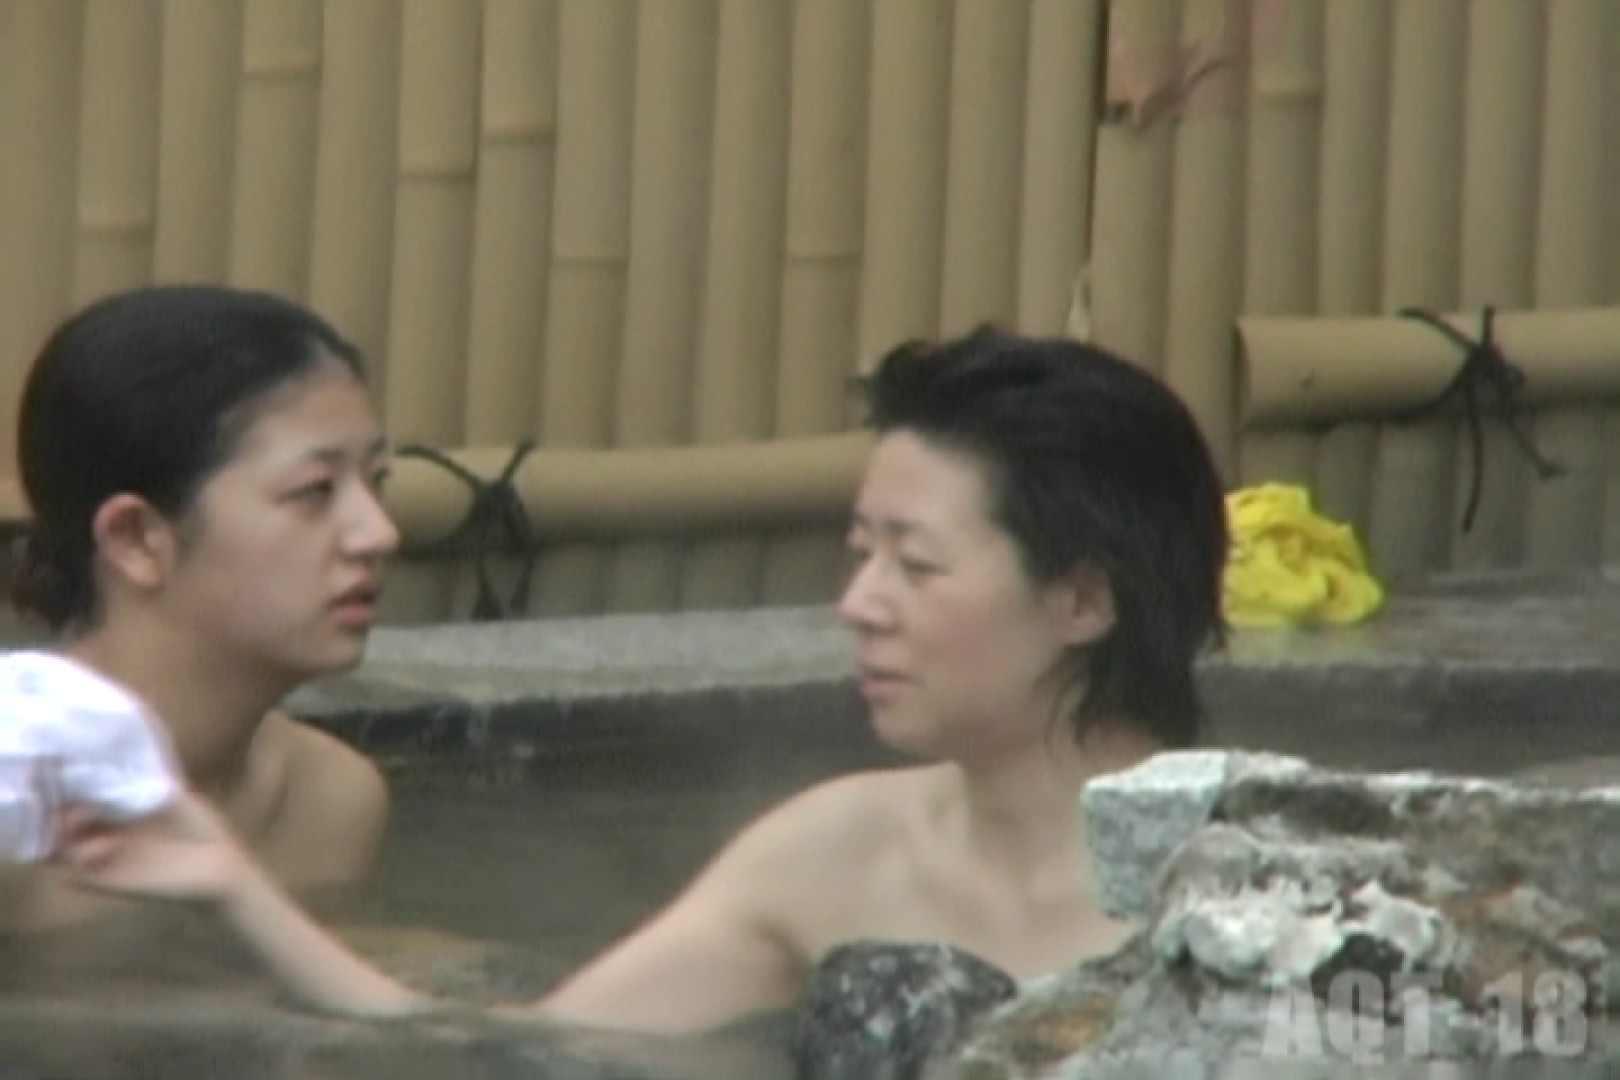 Aquaな露天風呂Vol.859 露天風呂編  76PIX 6